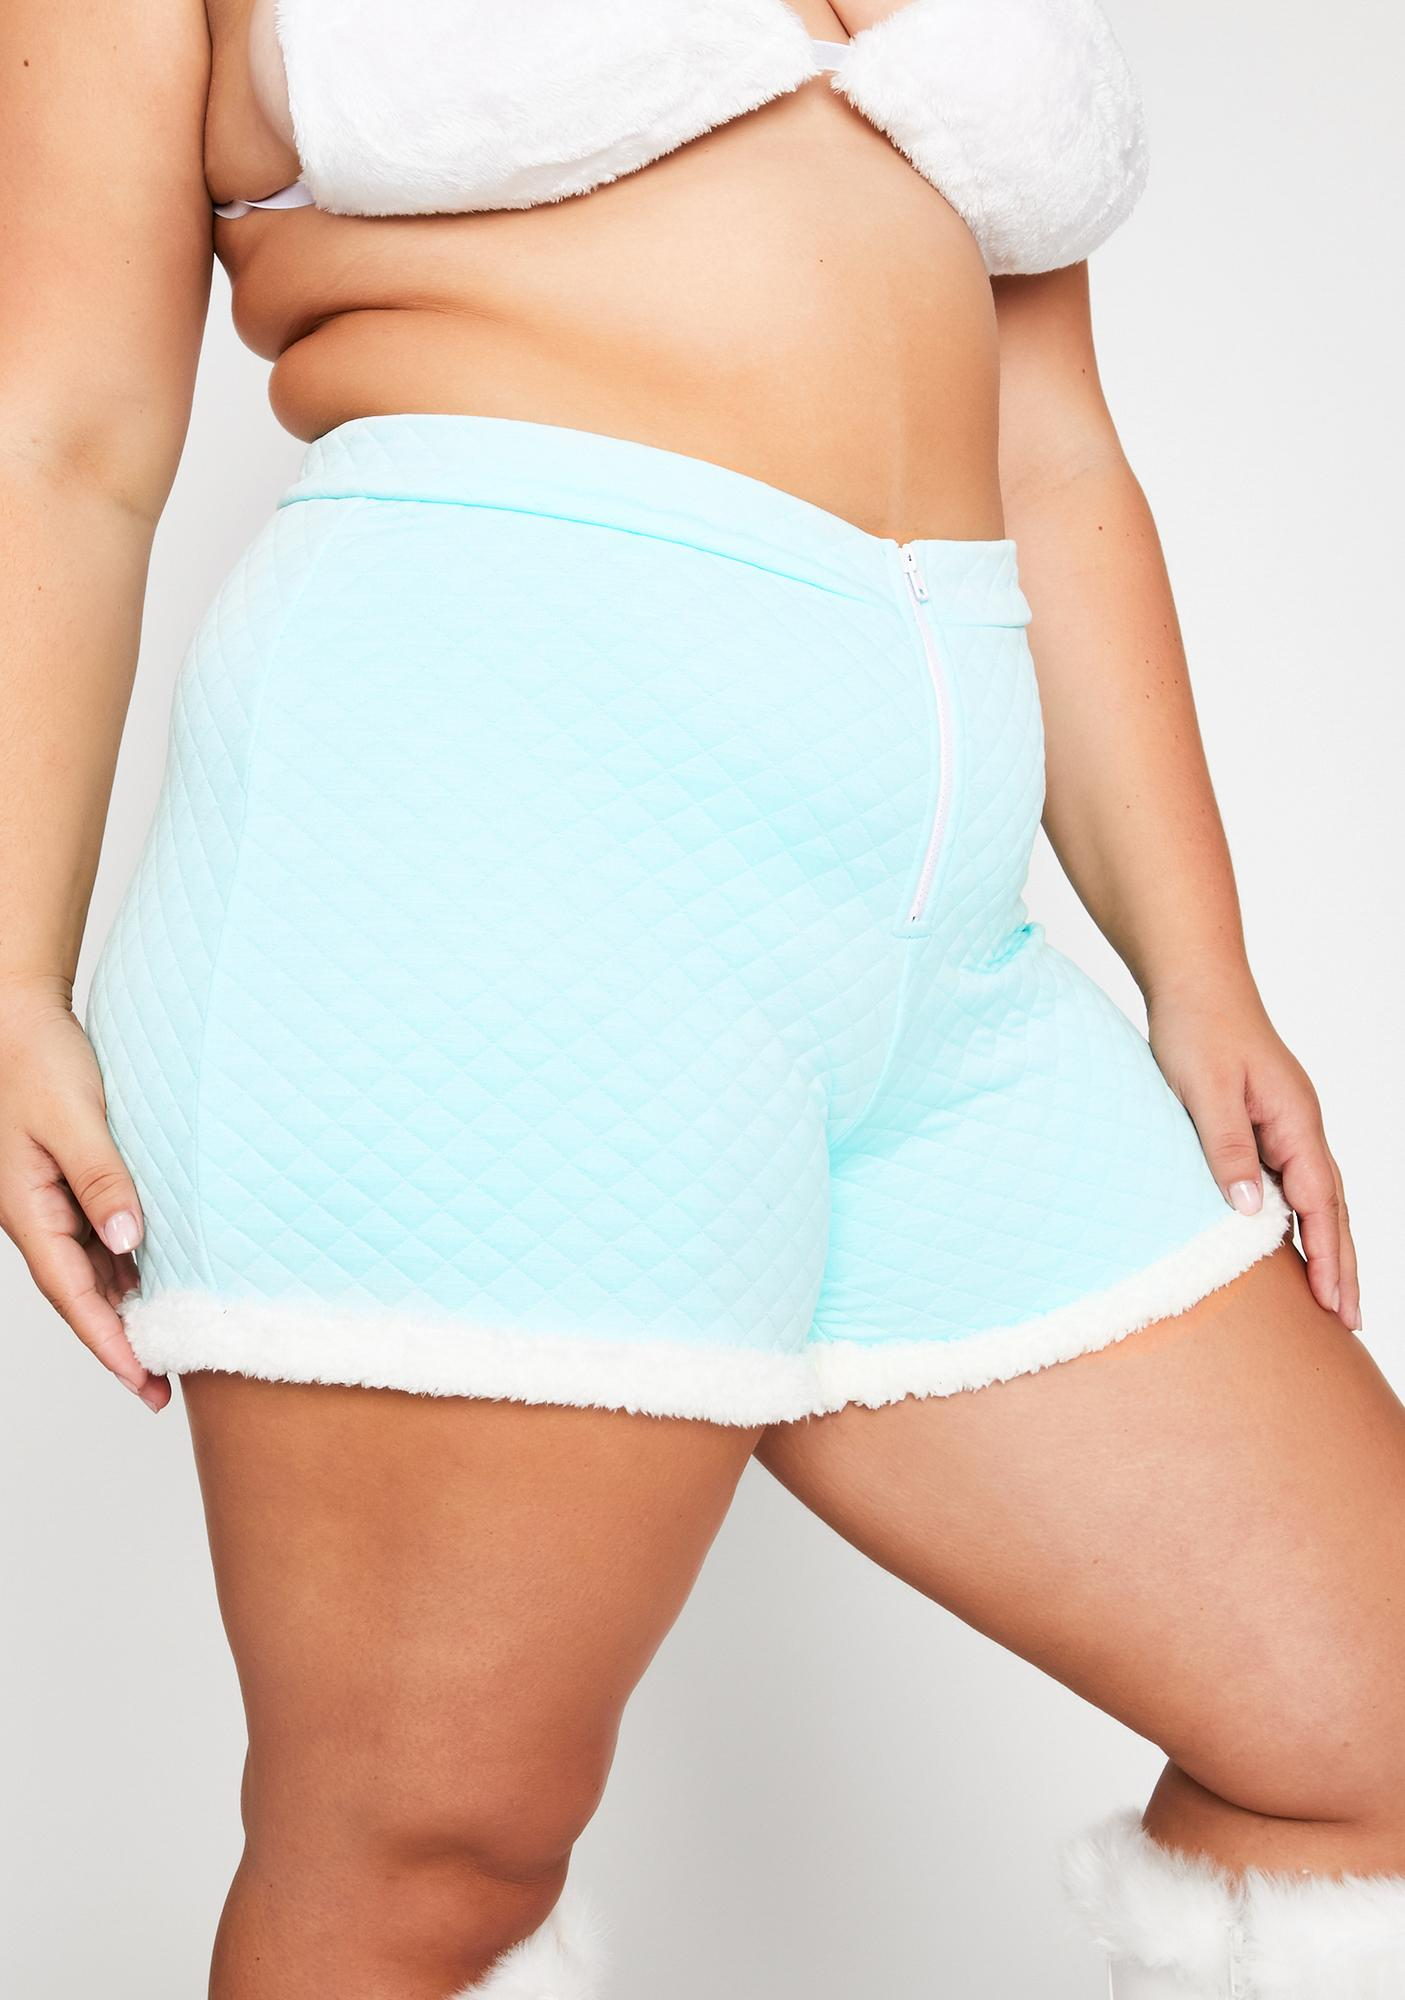 Powder Legit Soft Gurl Hours Fur Trim Shorts